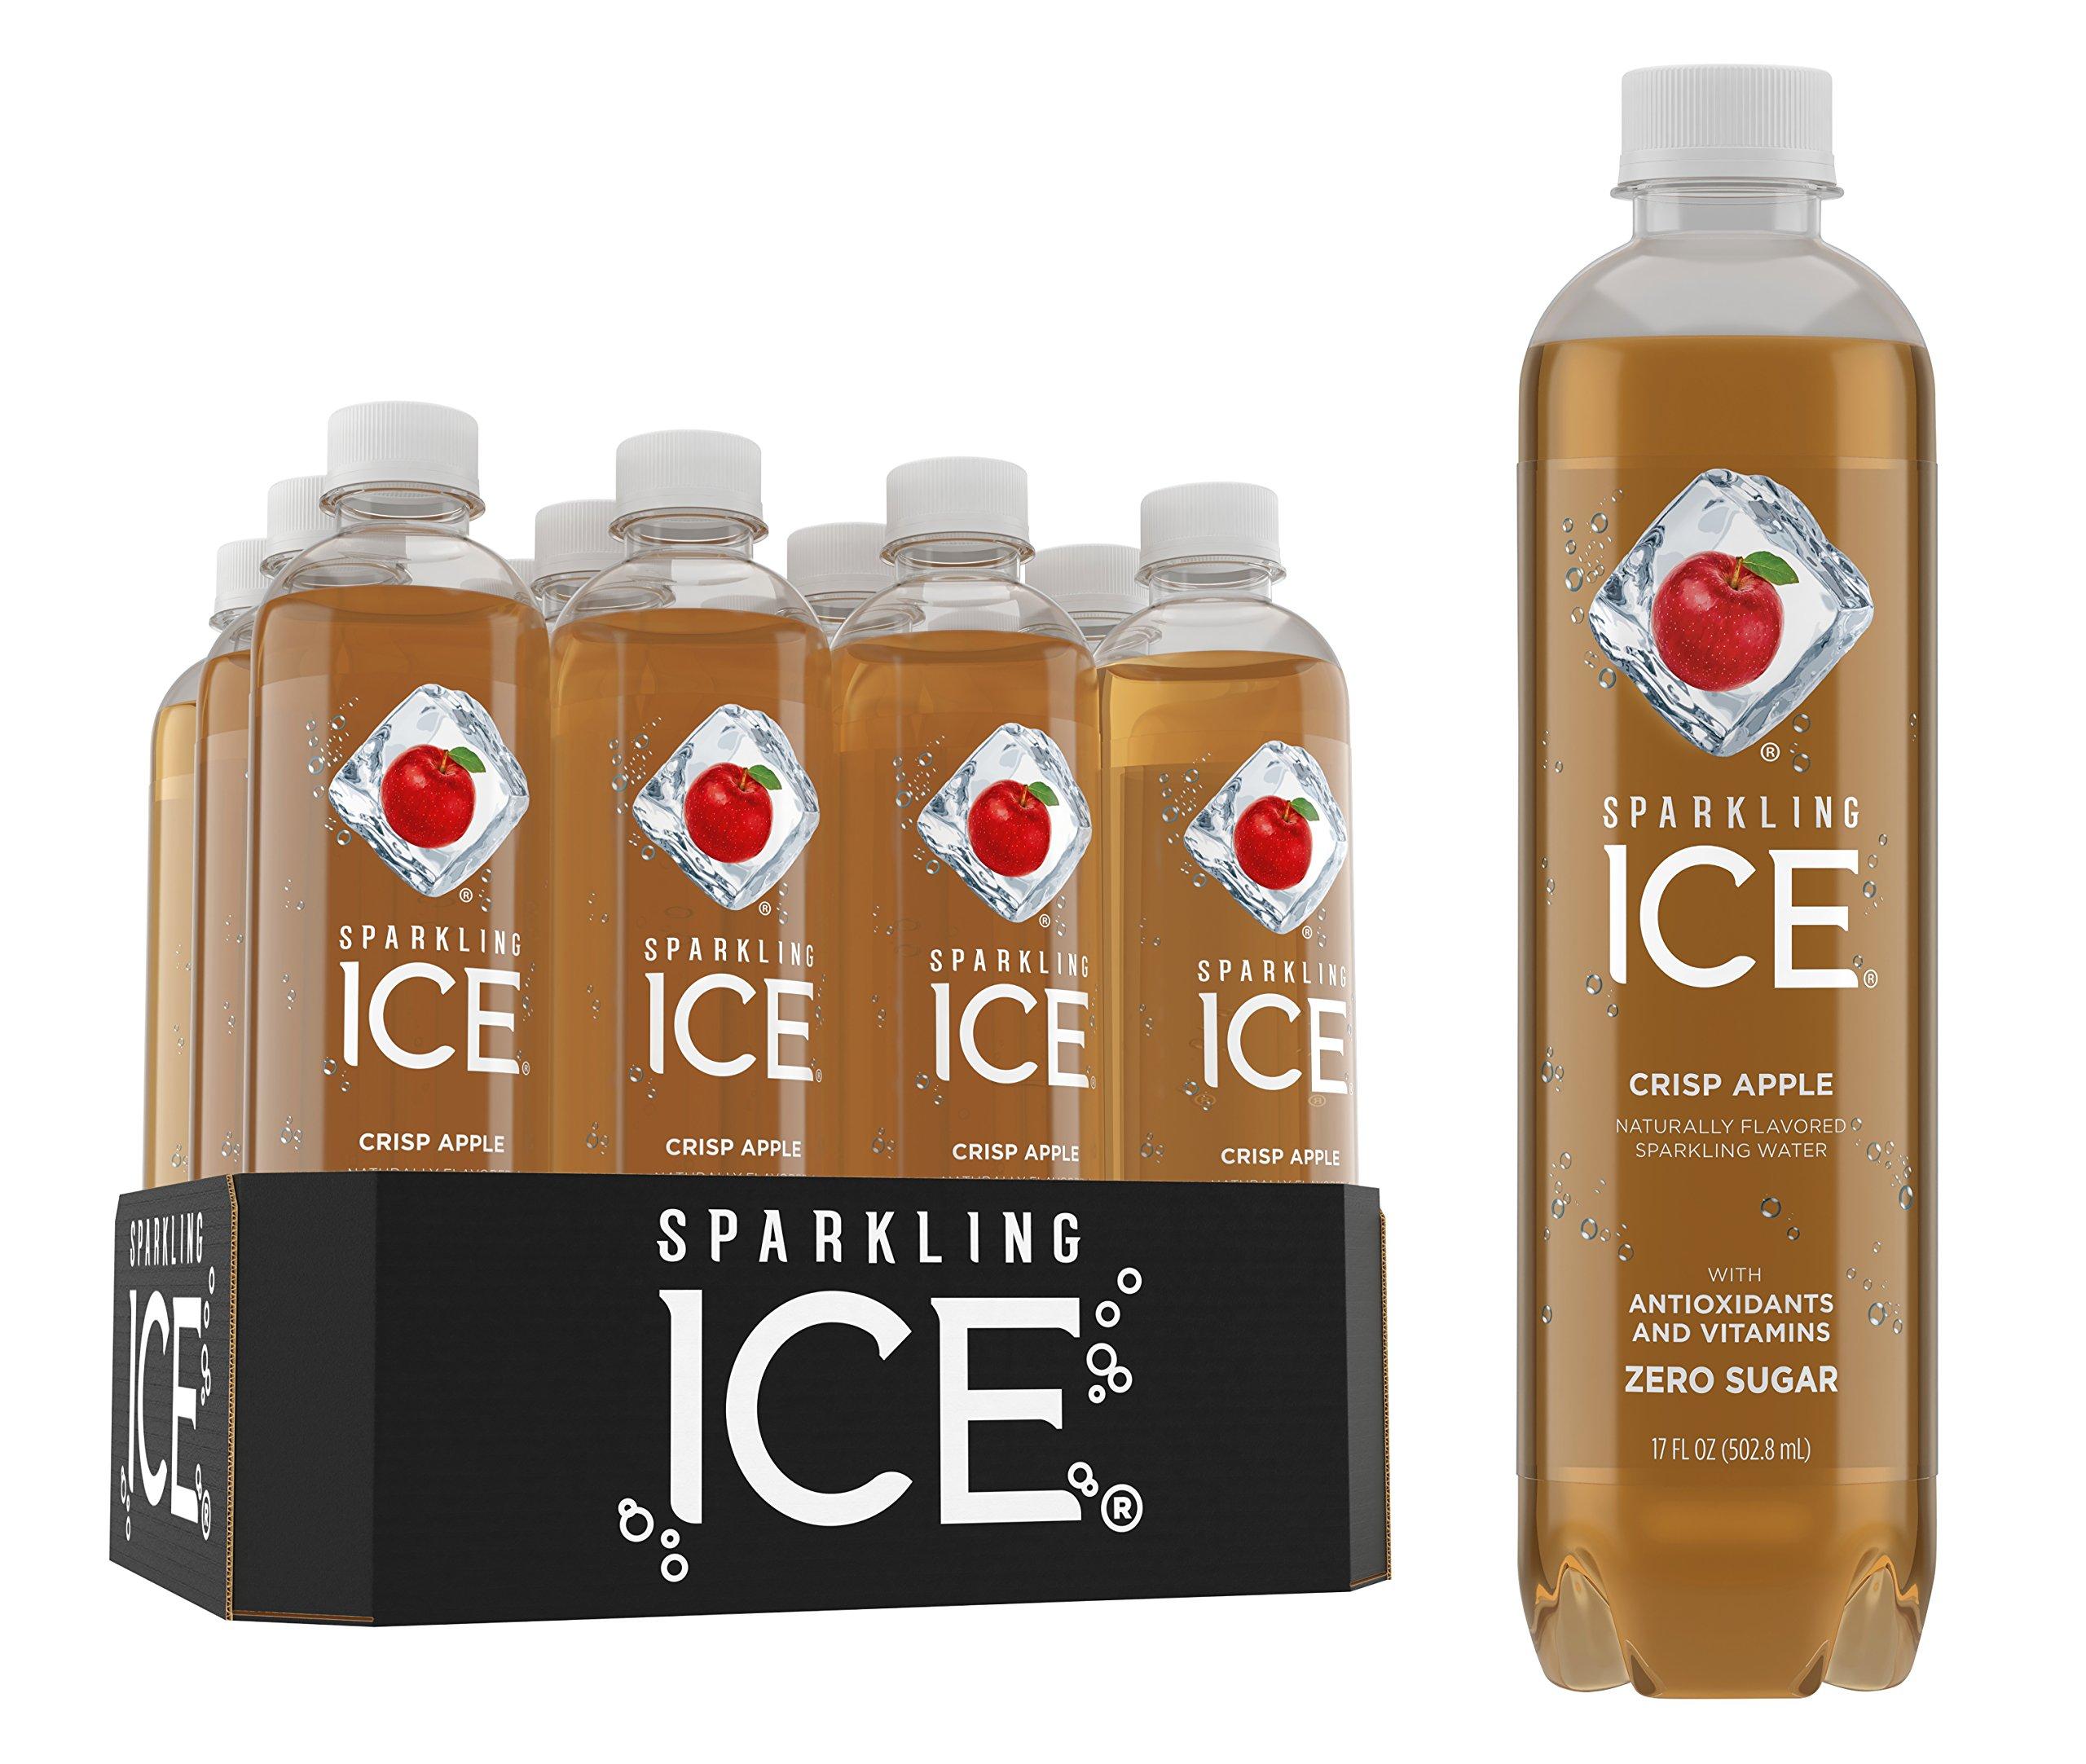 Sparkling Ice, Crisp Apple Sparkling Water, with antioxidants and vitamins, Zero Sugar, 17 FL OZ Bottles (Pack of 12)